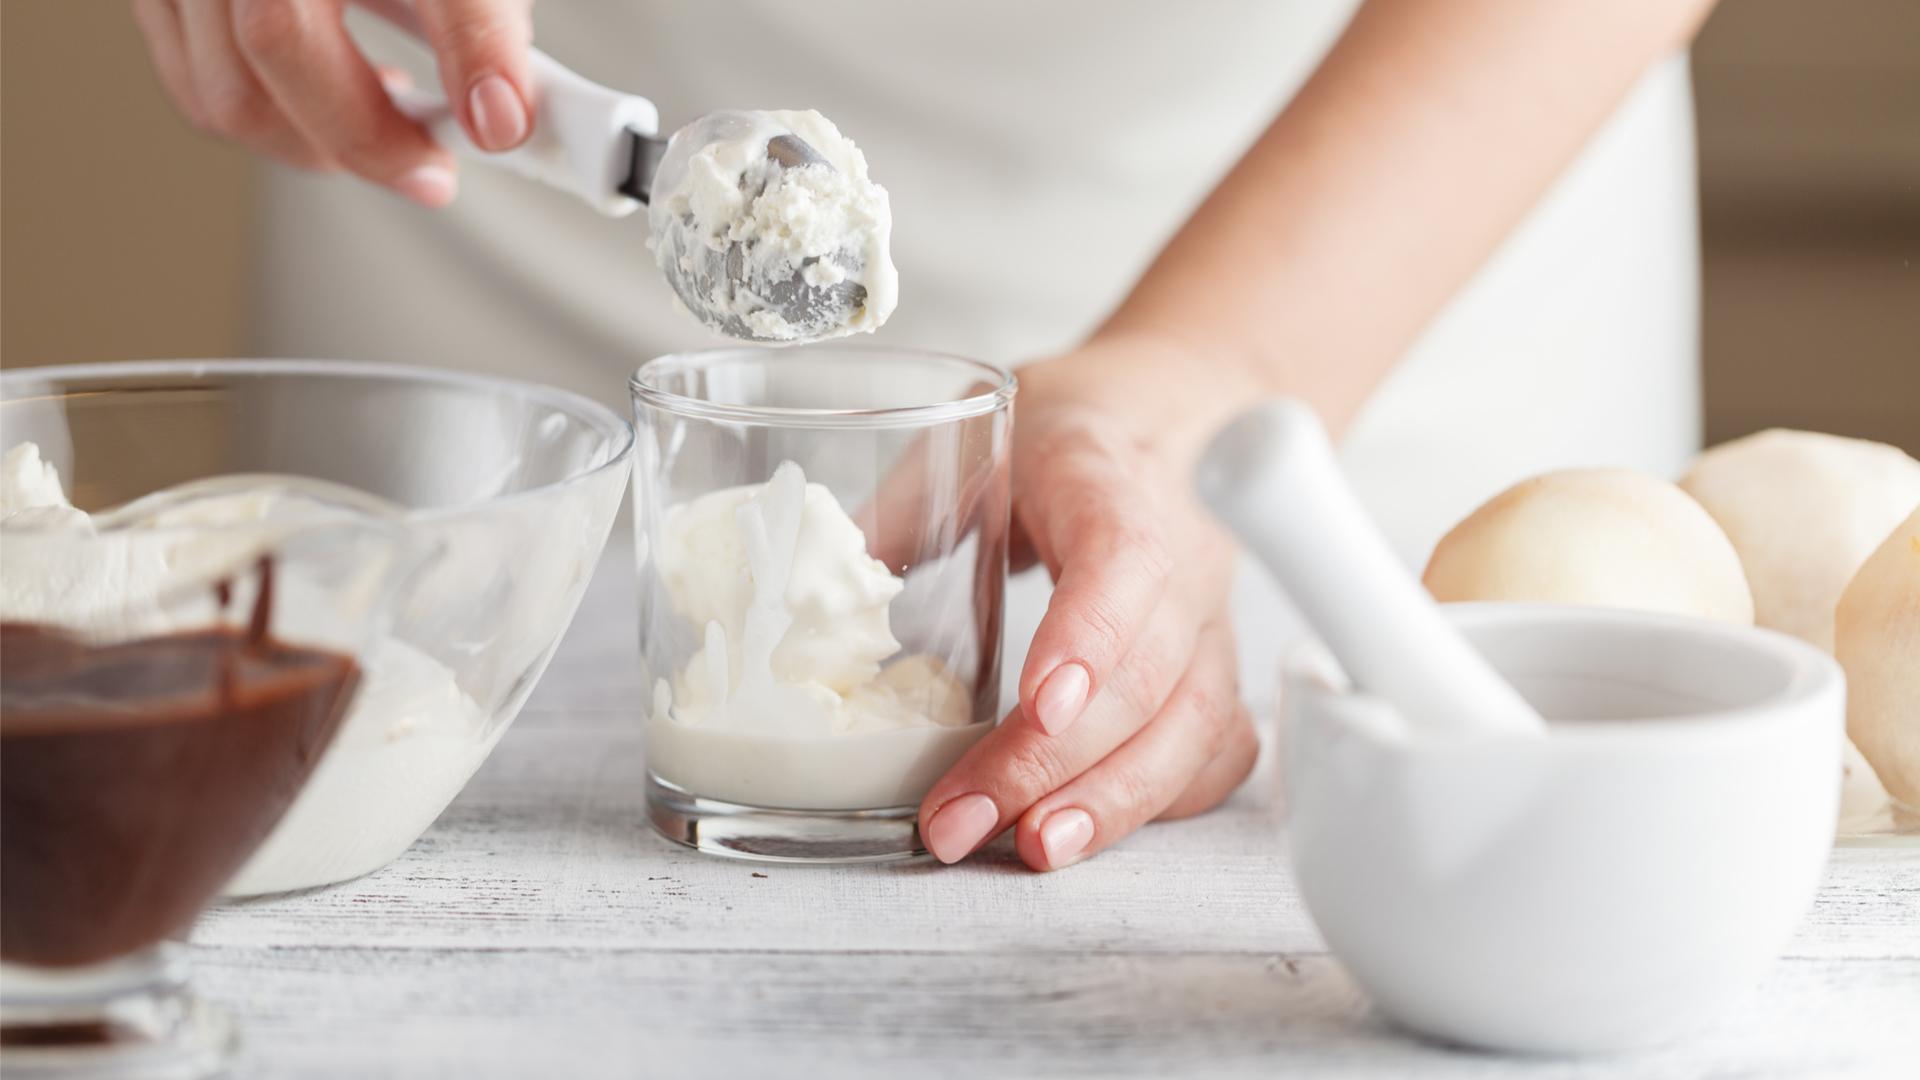 Making almond ice cream